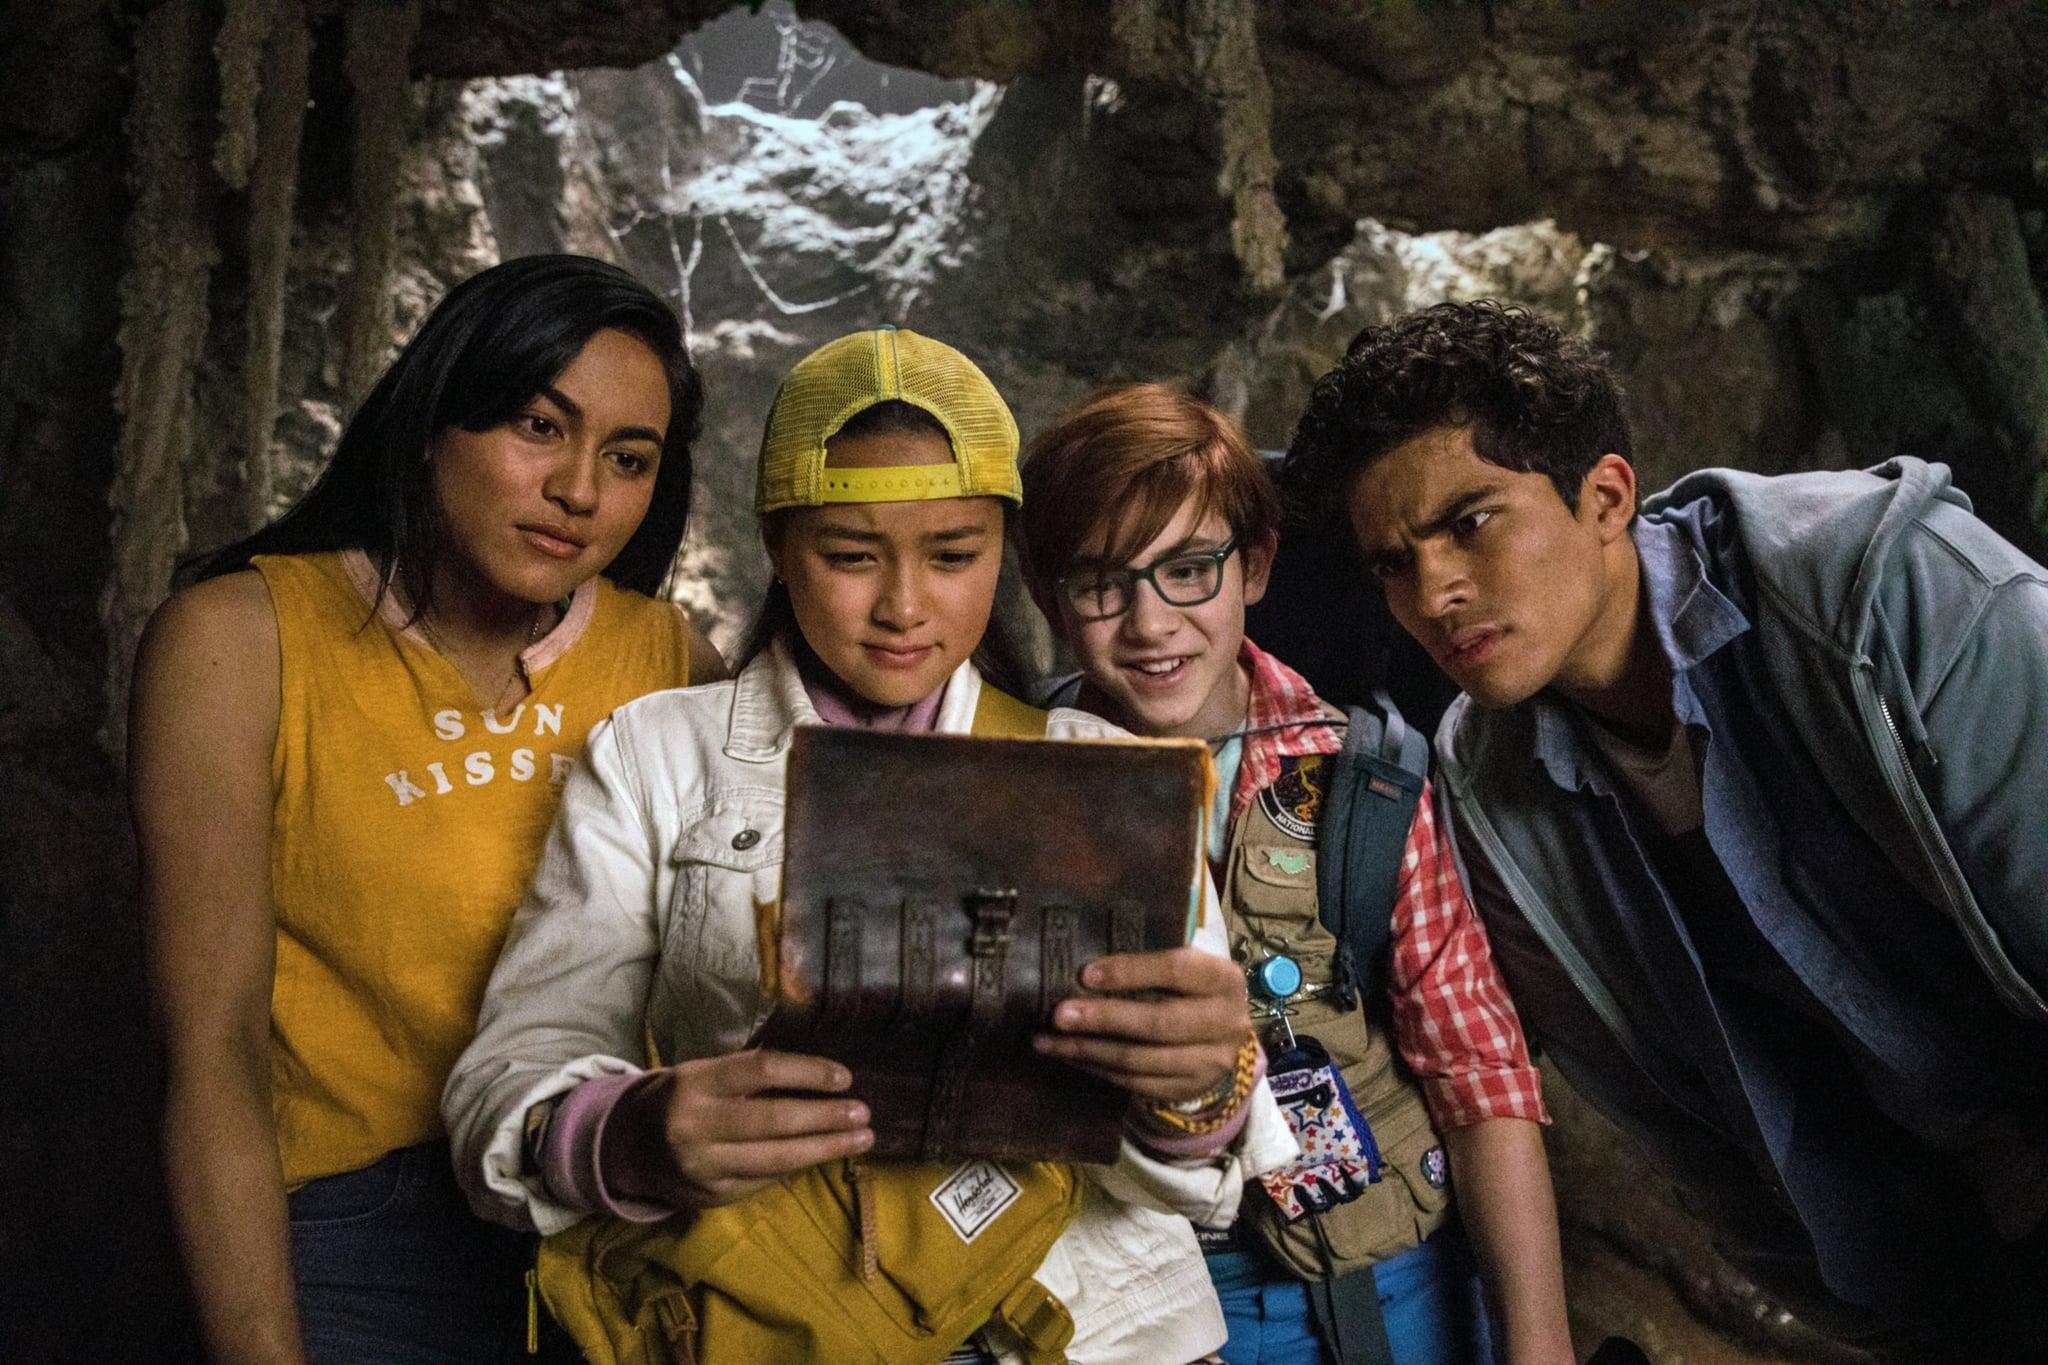 FINDING OHANA, from left: Lindsay Watson, Kea Peahu, Owen Vaccaro, Alex Aion, 2021. ph: Chris Moore /  Netflix / Courtesy Everett Collection